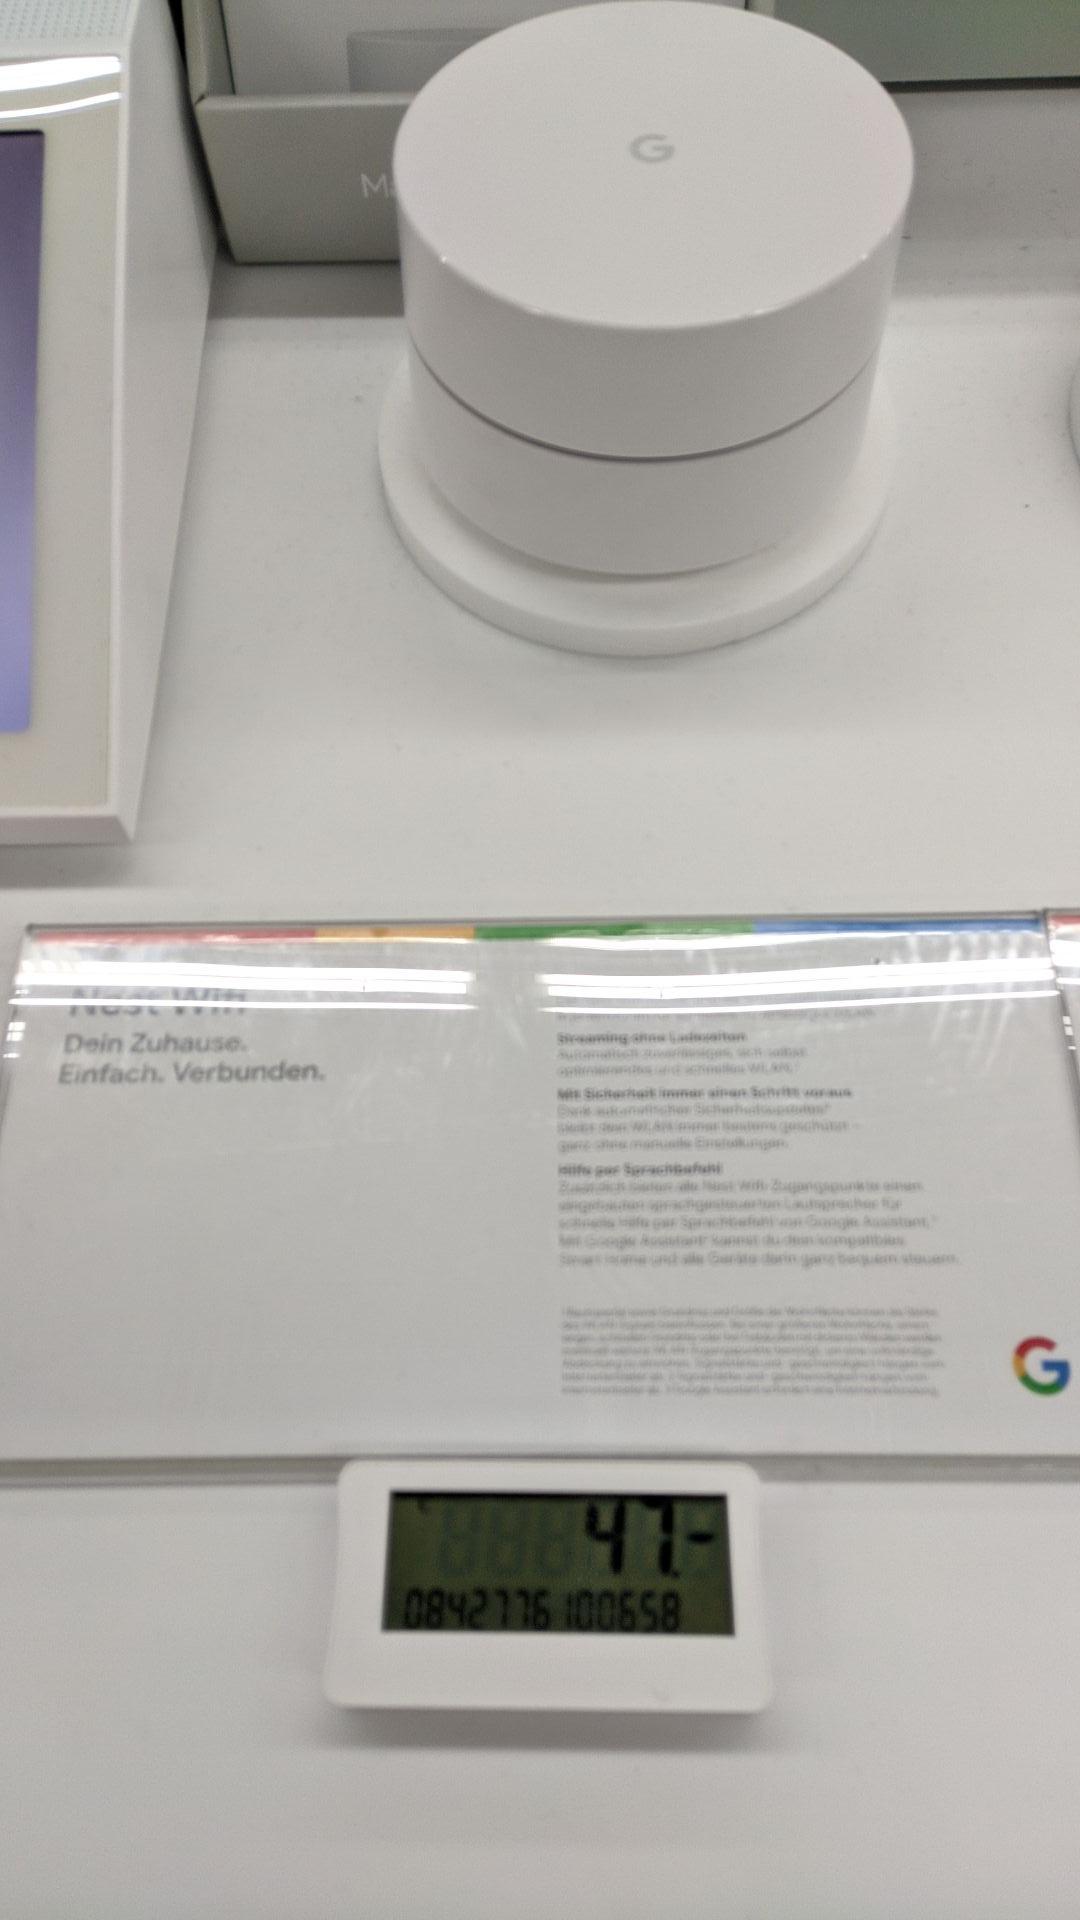 Google Wifi (1. Generation)